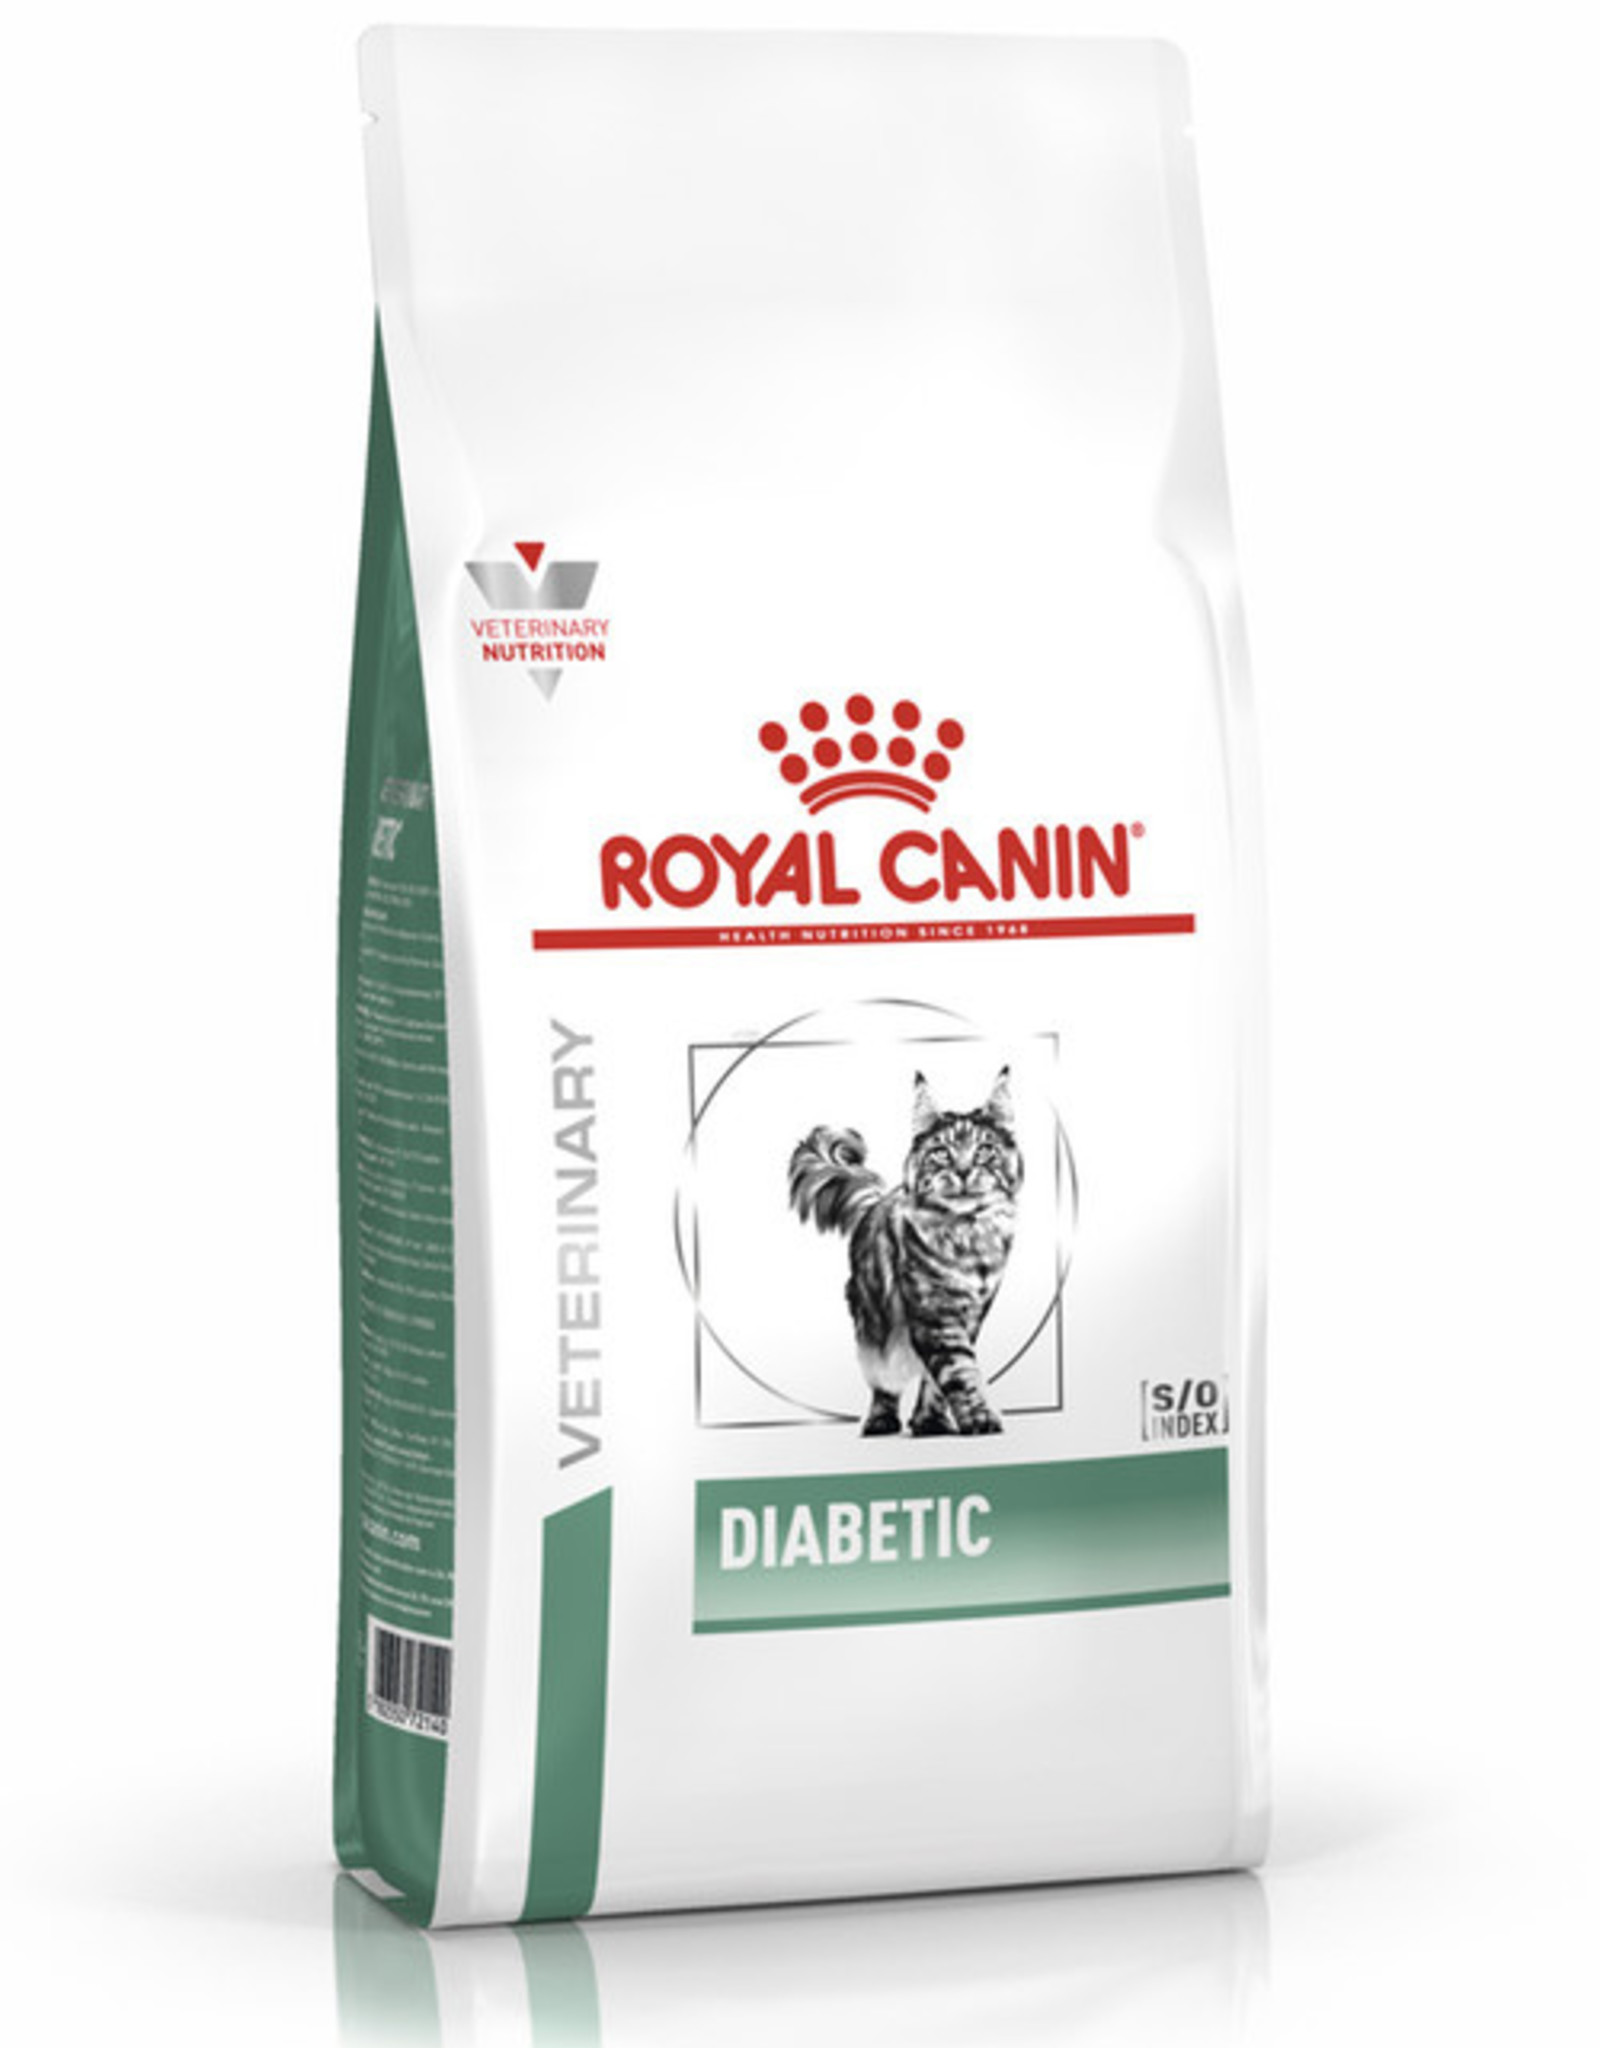 Royal Canin Royal Canin Vdiet Diabetic Kat 3,5kg